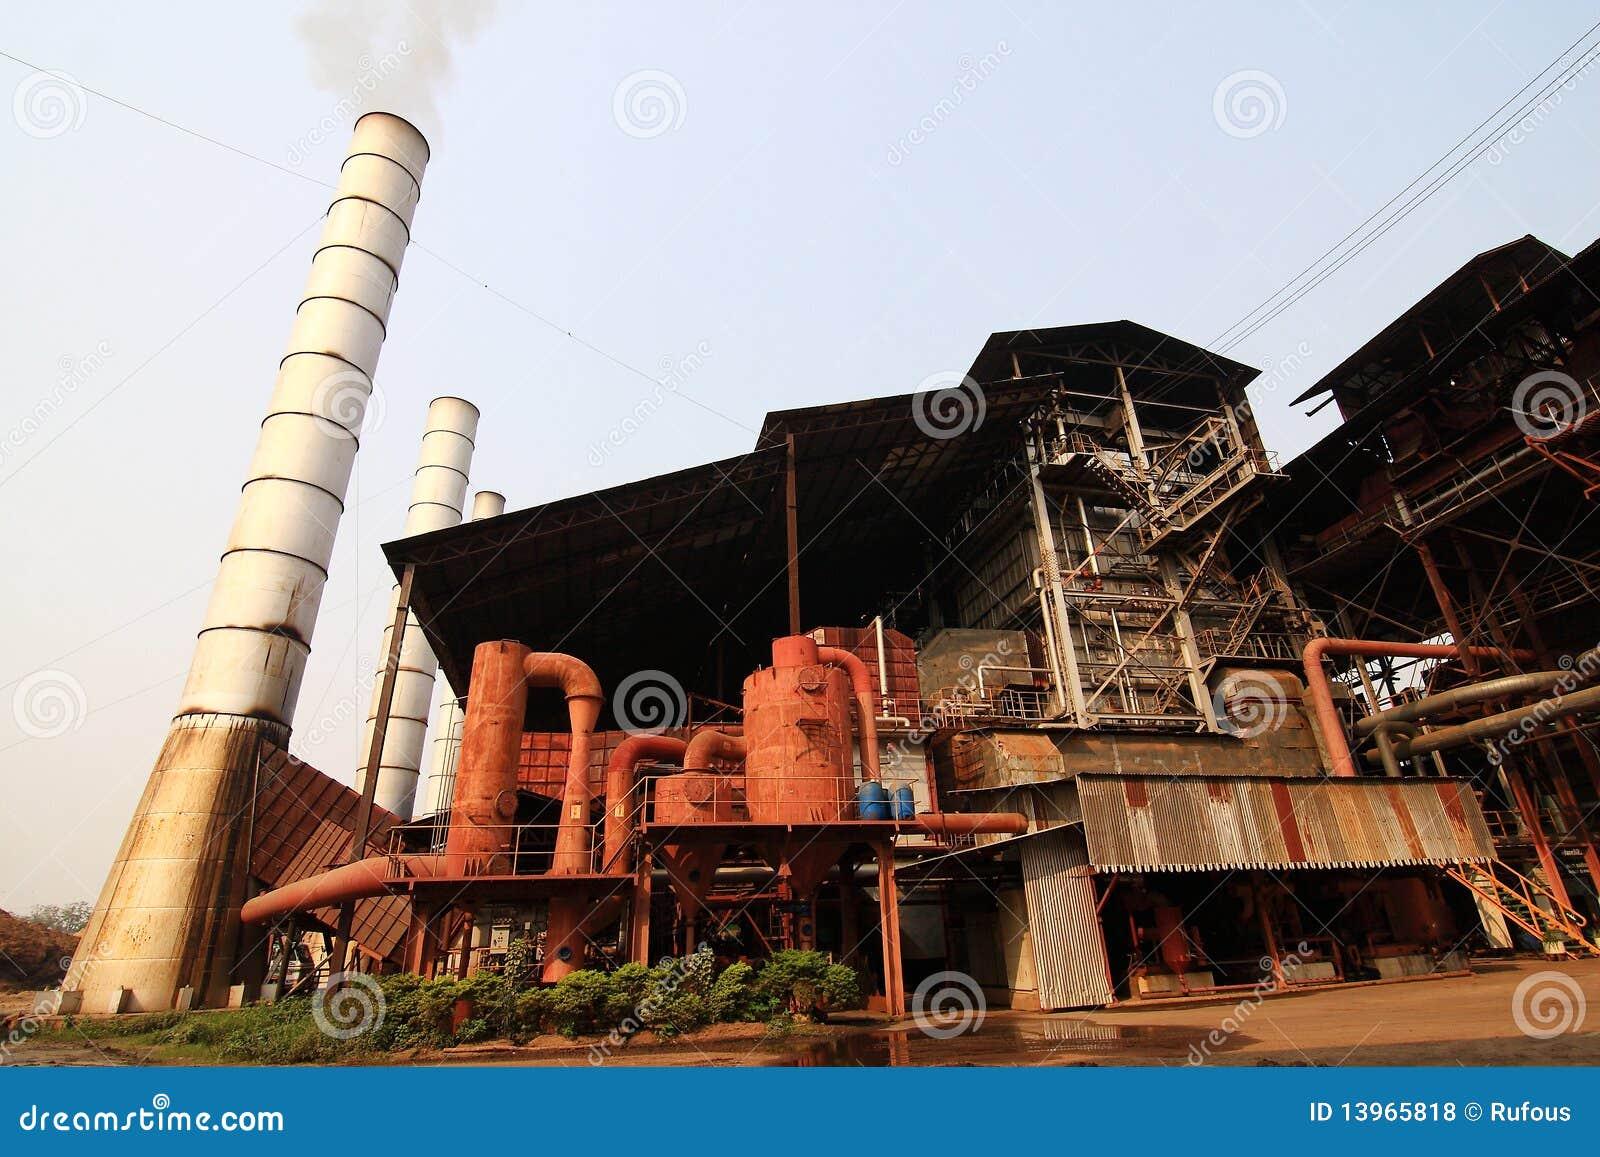 Sugar Cane Factory Royalty Free Stock Photos - Image: 13965818